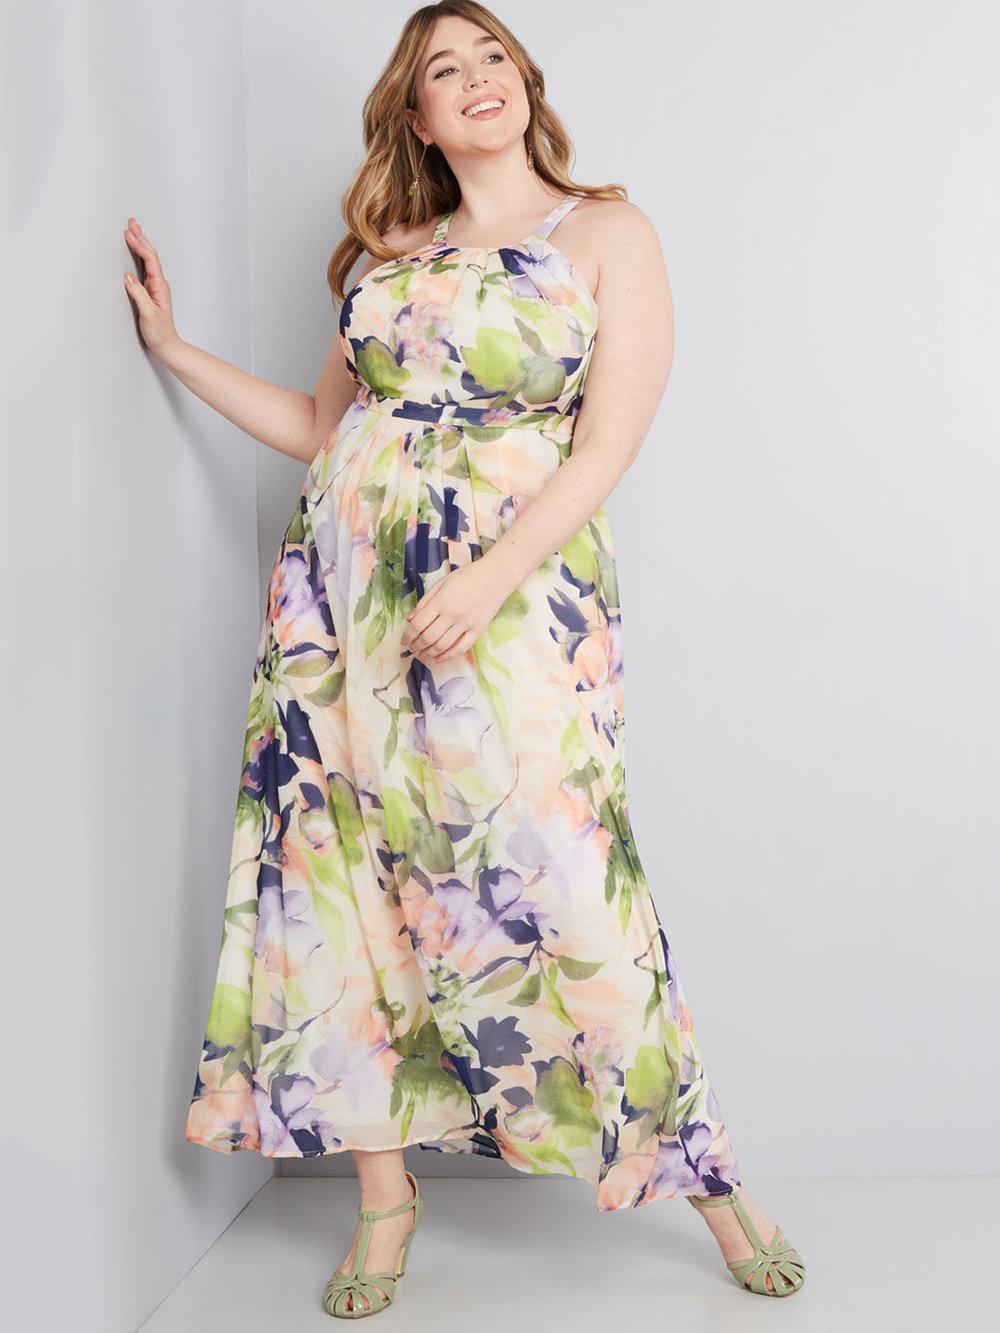 curvy-con-dress-16.jpg